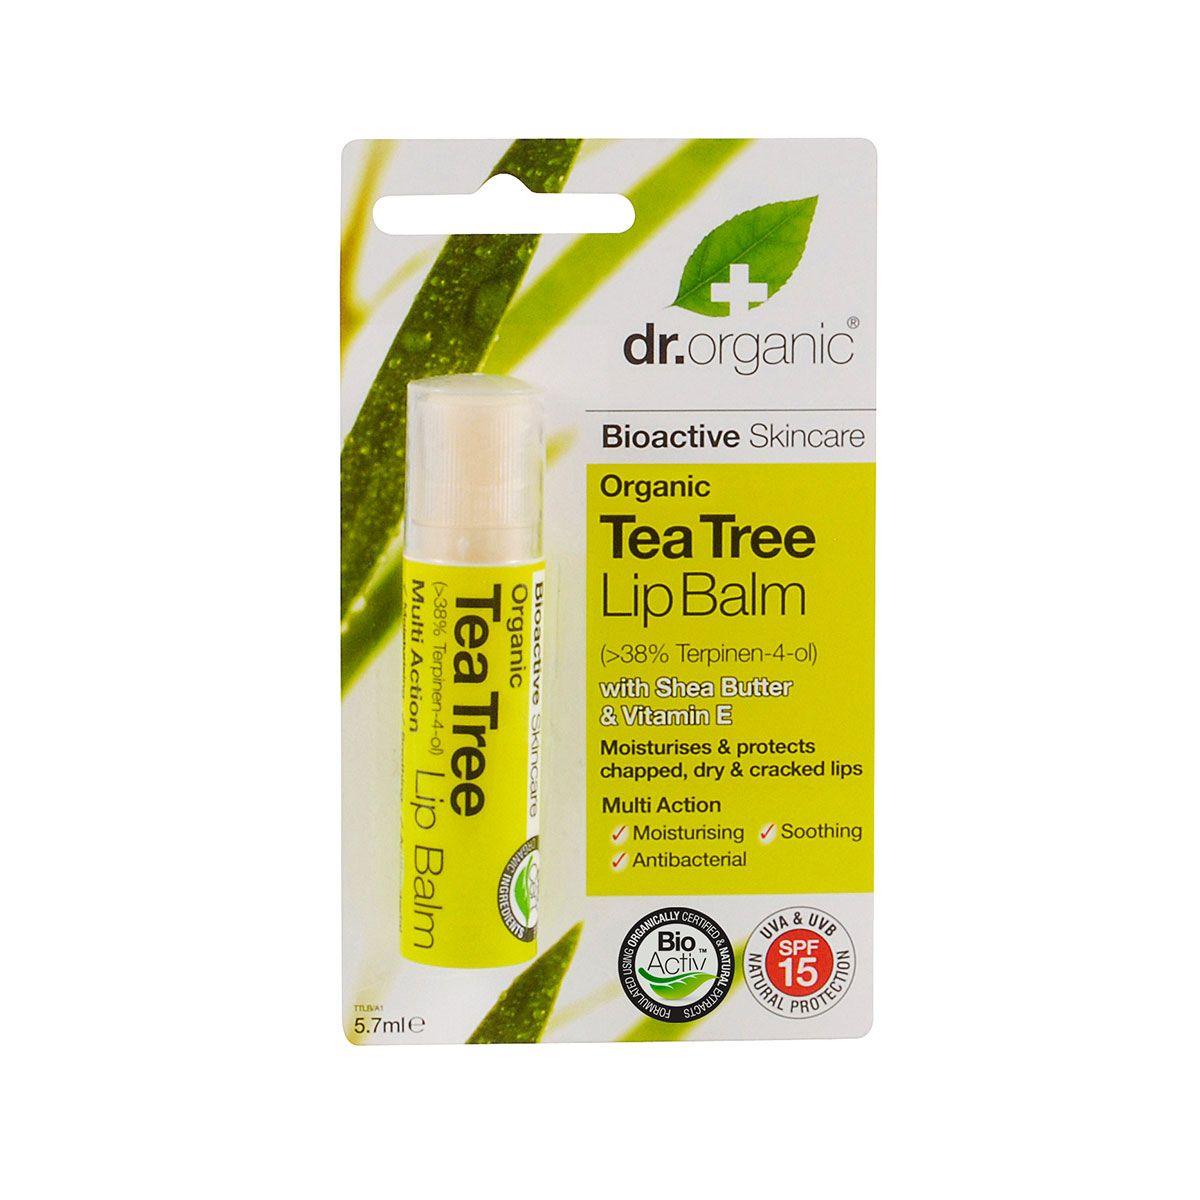 Tea-Tree-Lip-Balm